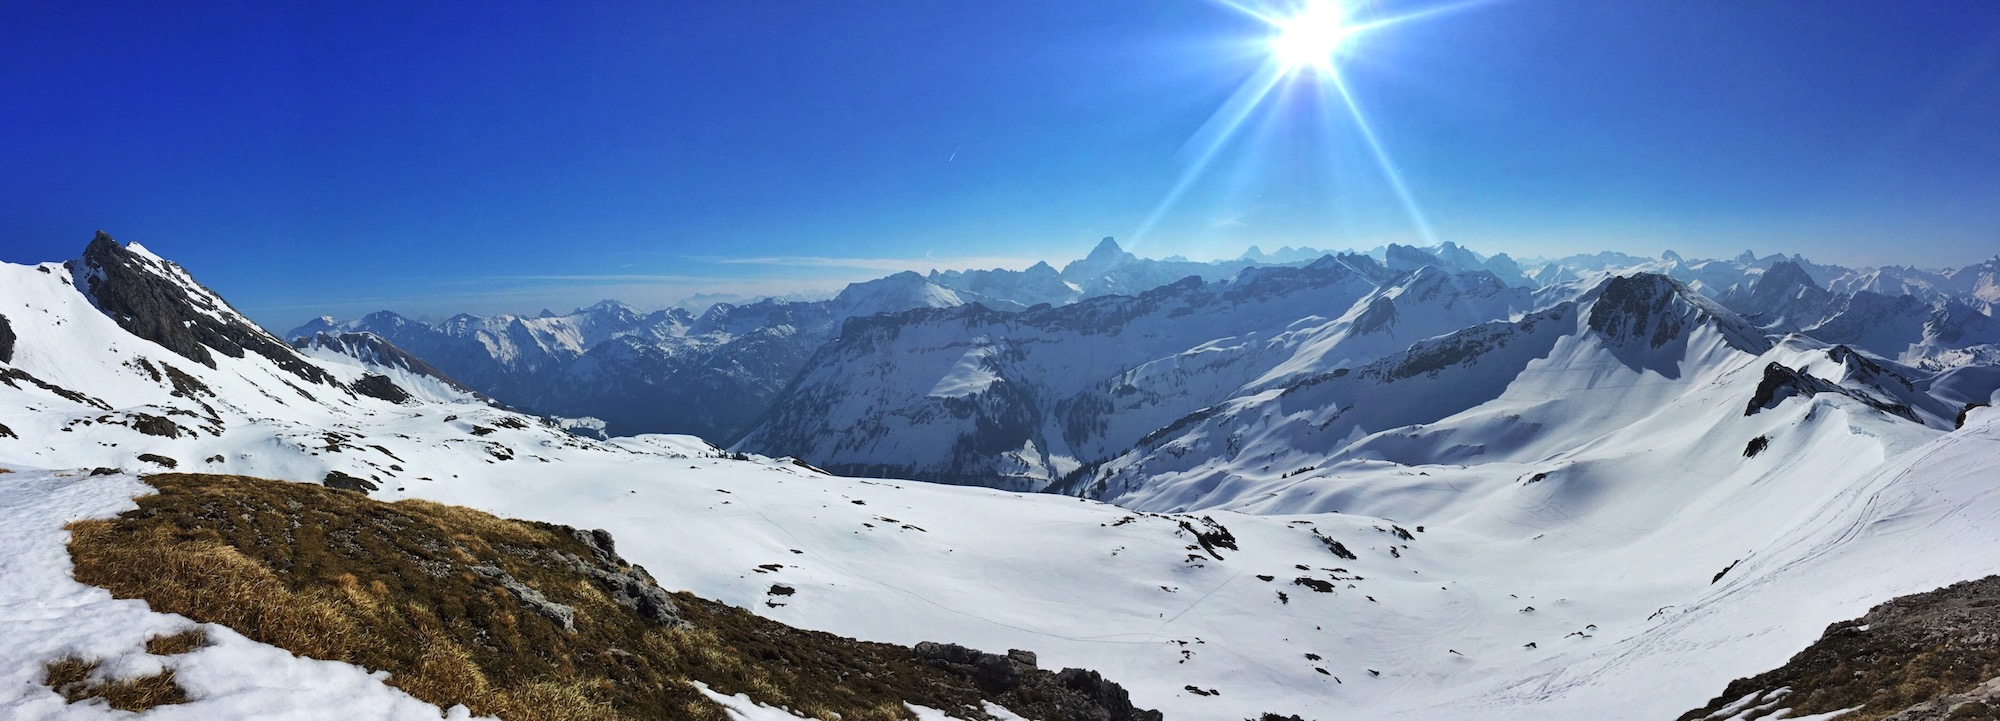 Winterpanorama am Nebelhorn